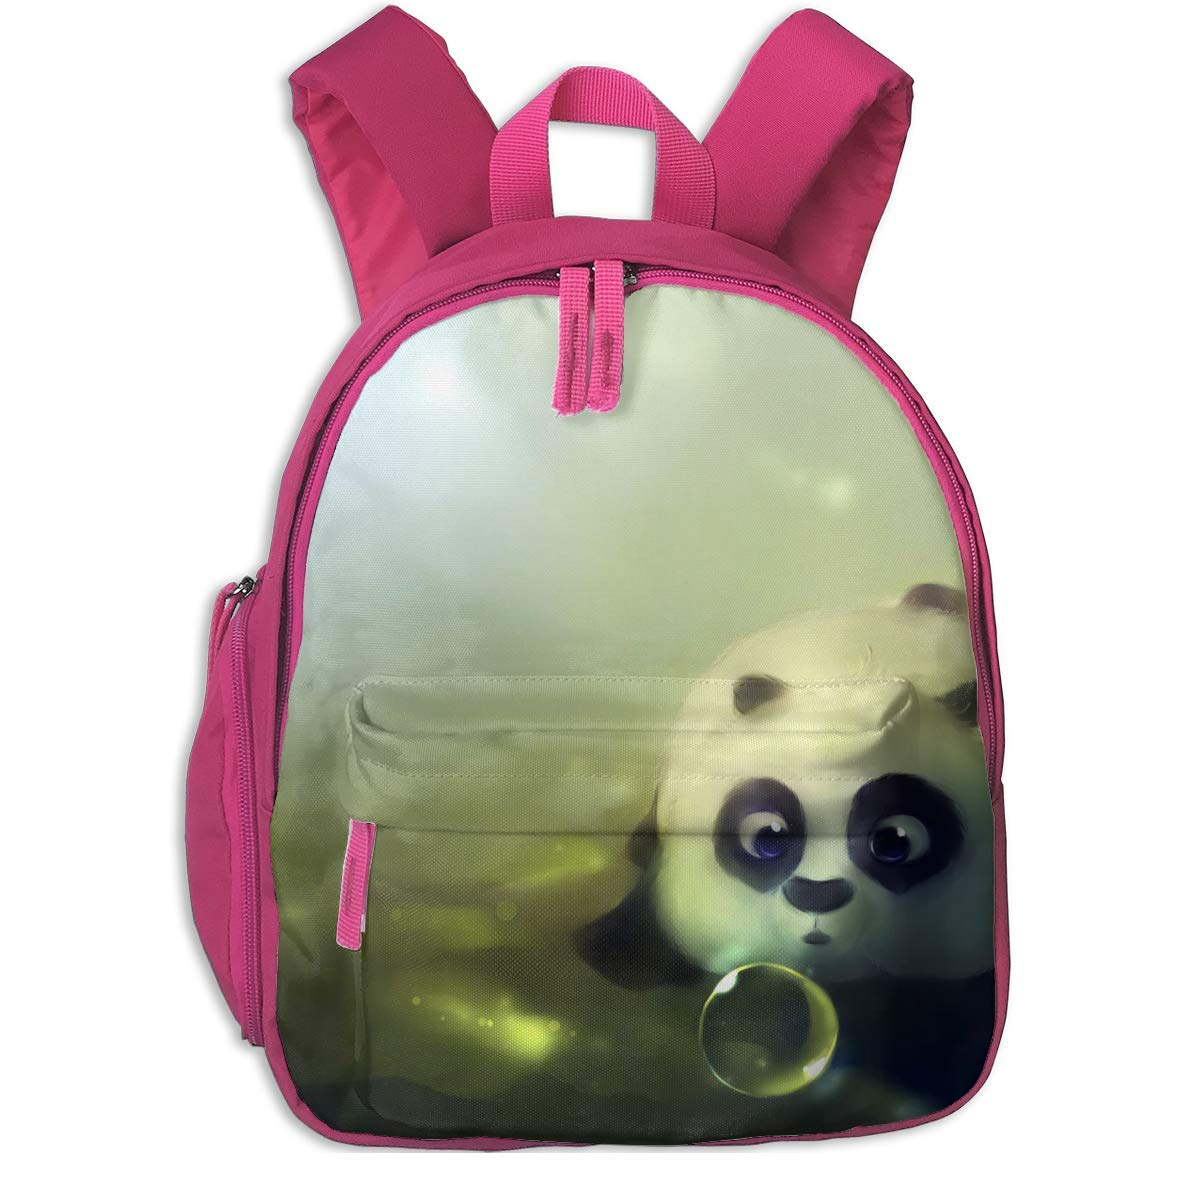 School Backpack for Girls Boys, Kids Cute Pan Grün Cartoon Backpacks Book Bag B07MNS2VC6 Daypacks Bevorzugtes Material